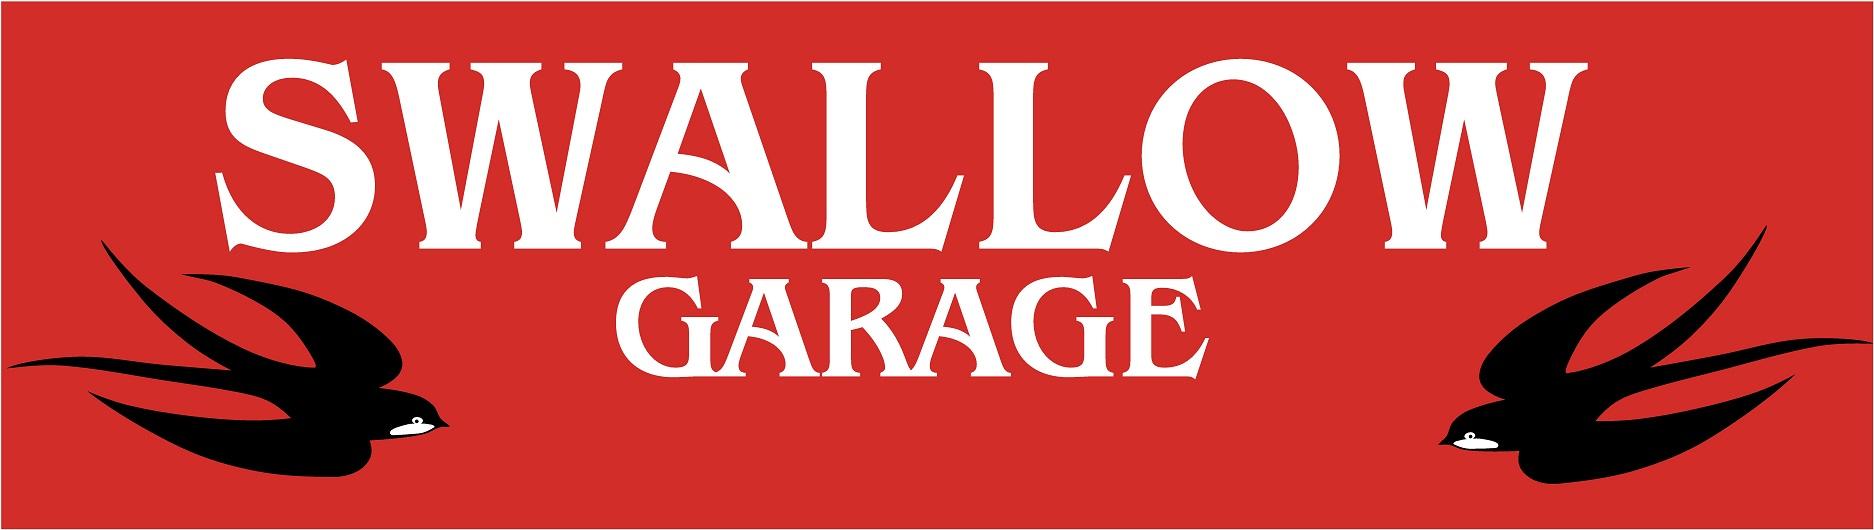 swallow garage